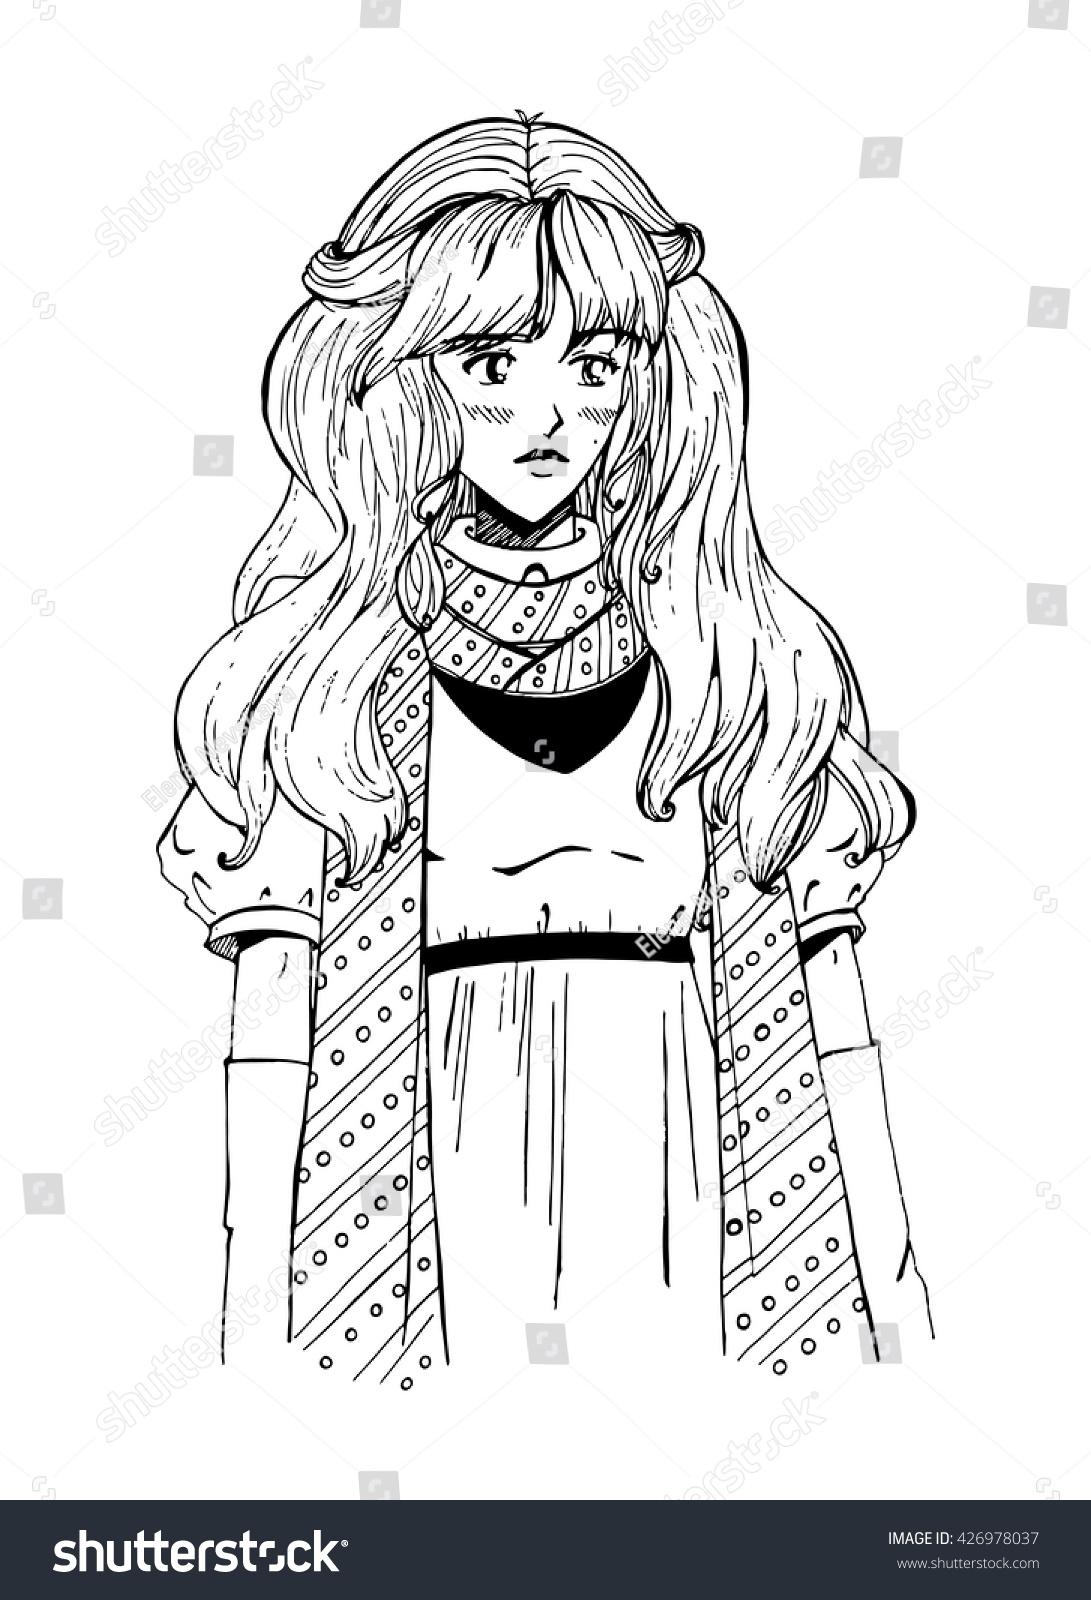 Vector illustration of beautiful manga girl with dreamy sad face long hair perfect